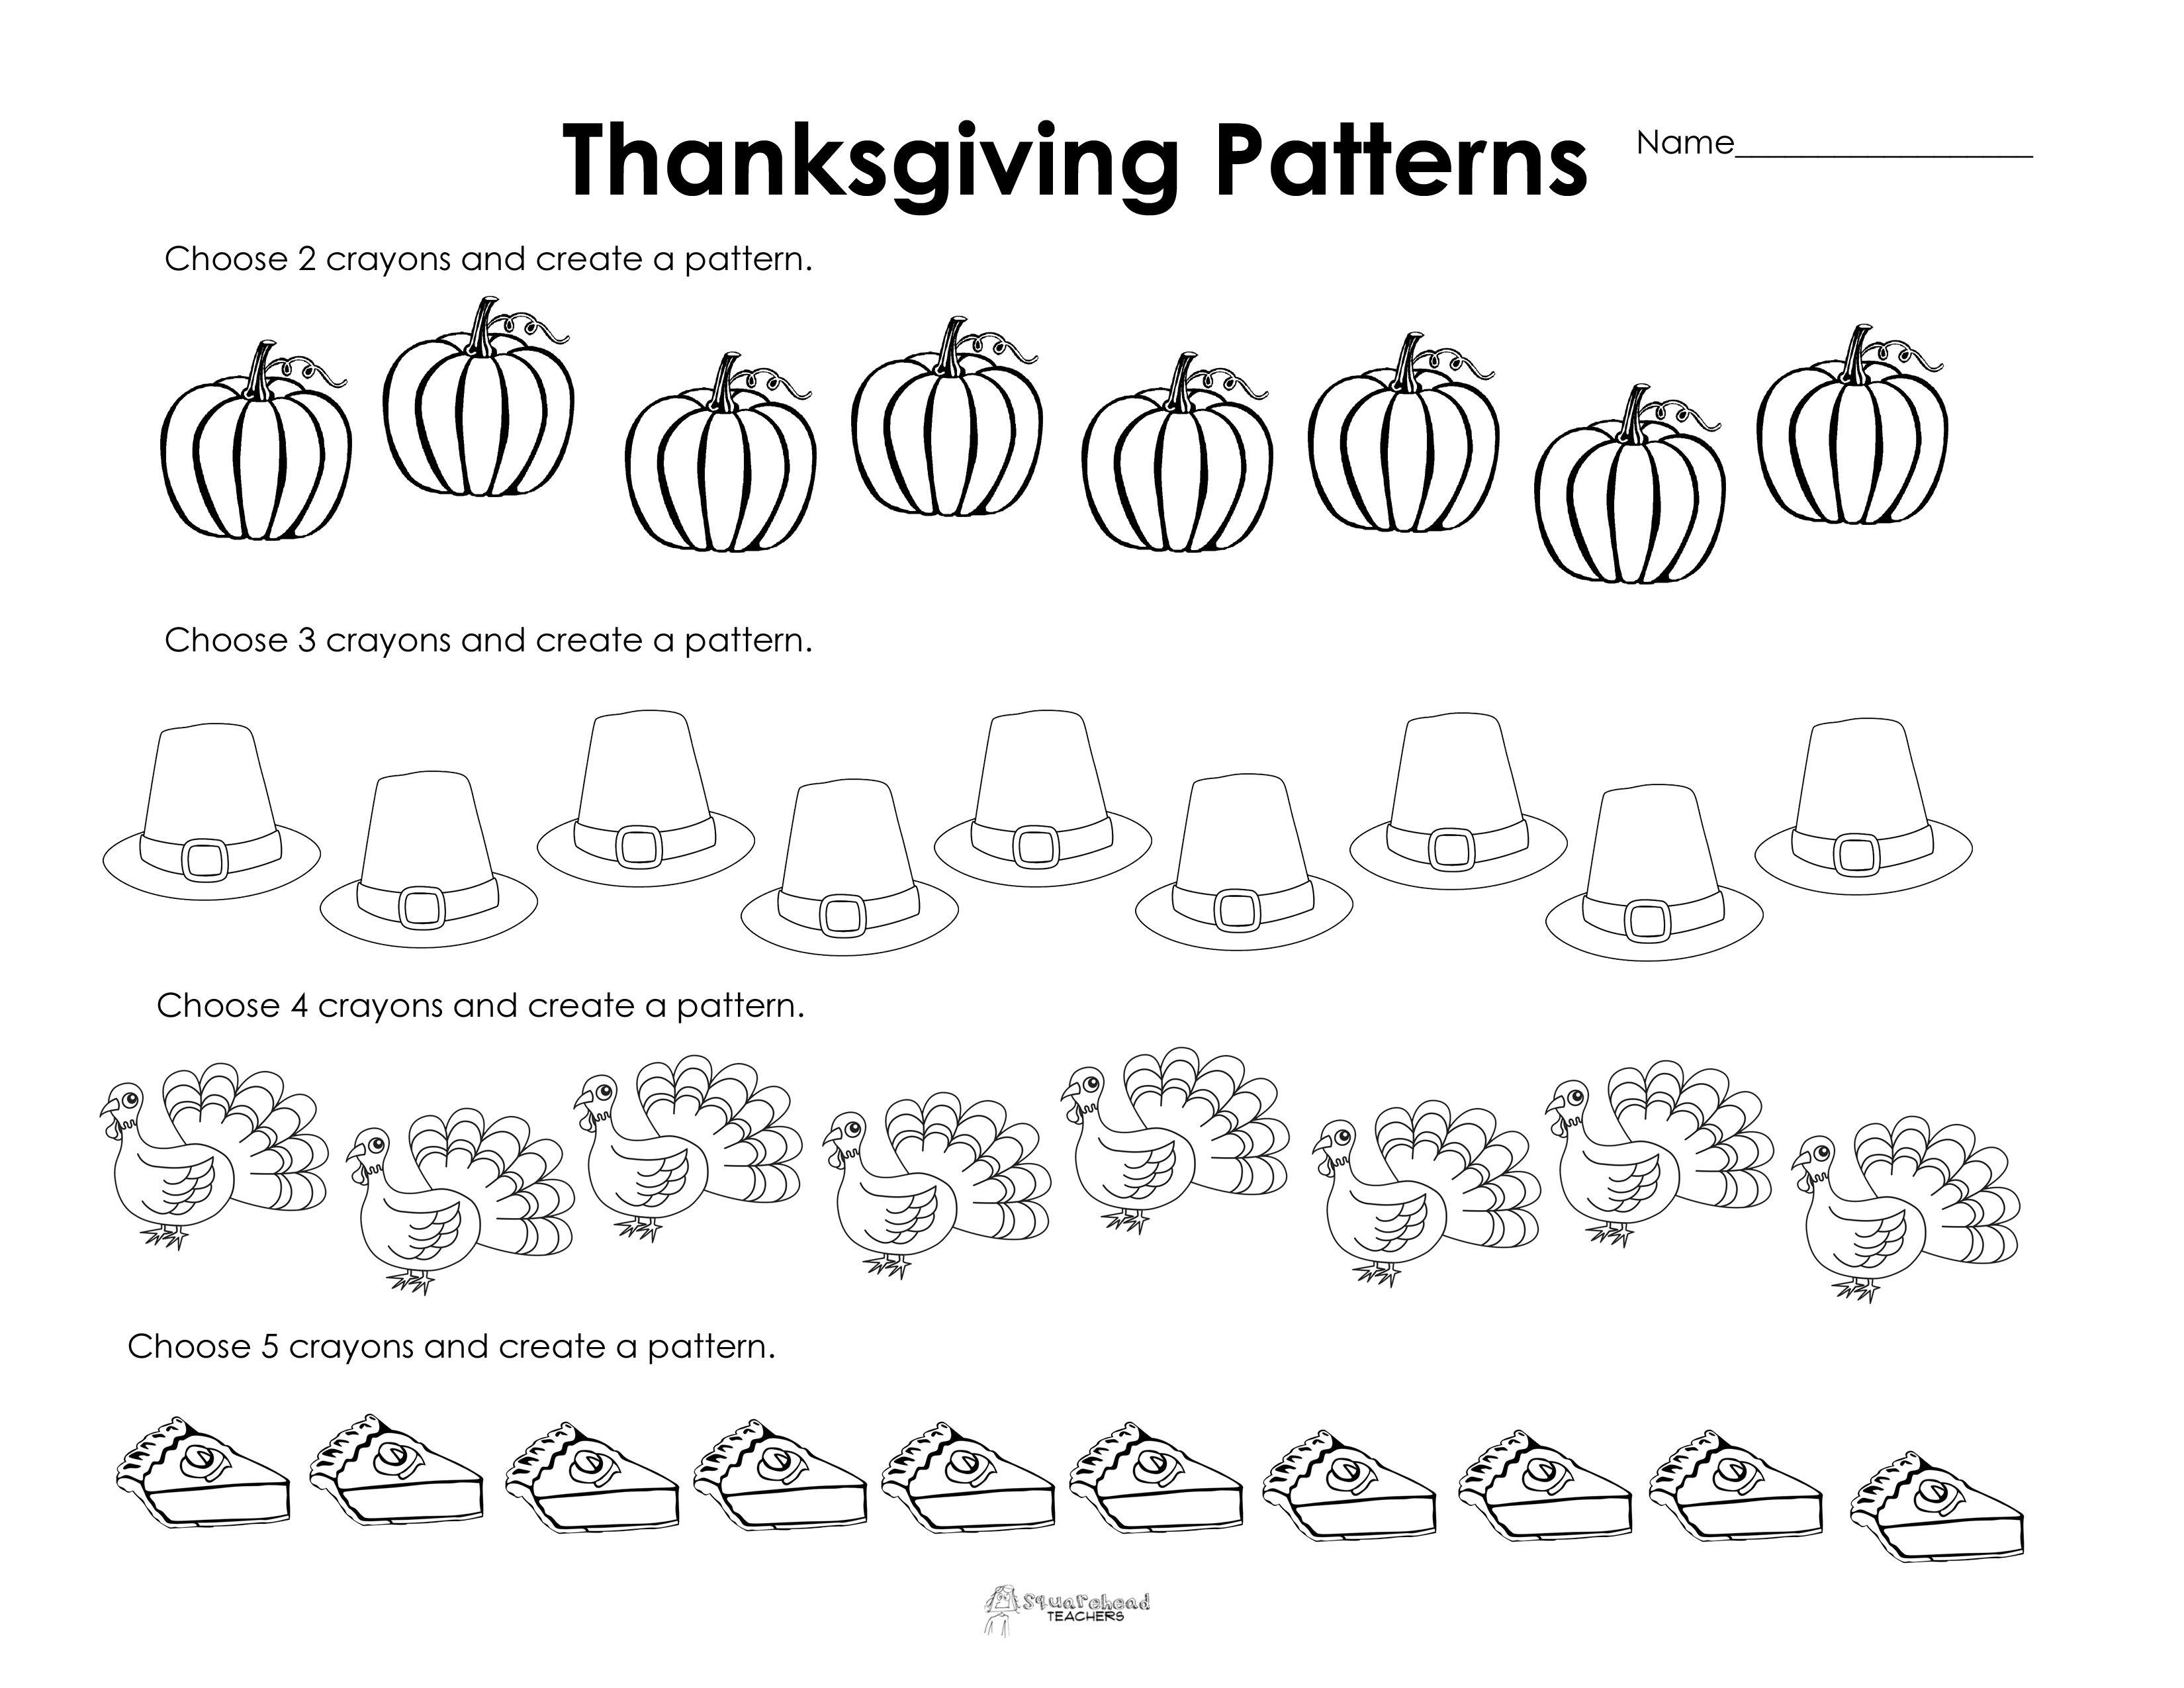 hight resolution of Making Patterns: Thanksgiving Style (free worksheet!)   Thanksgiving  worksheets